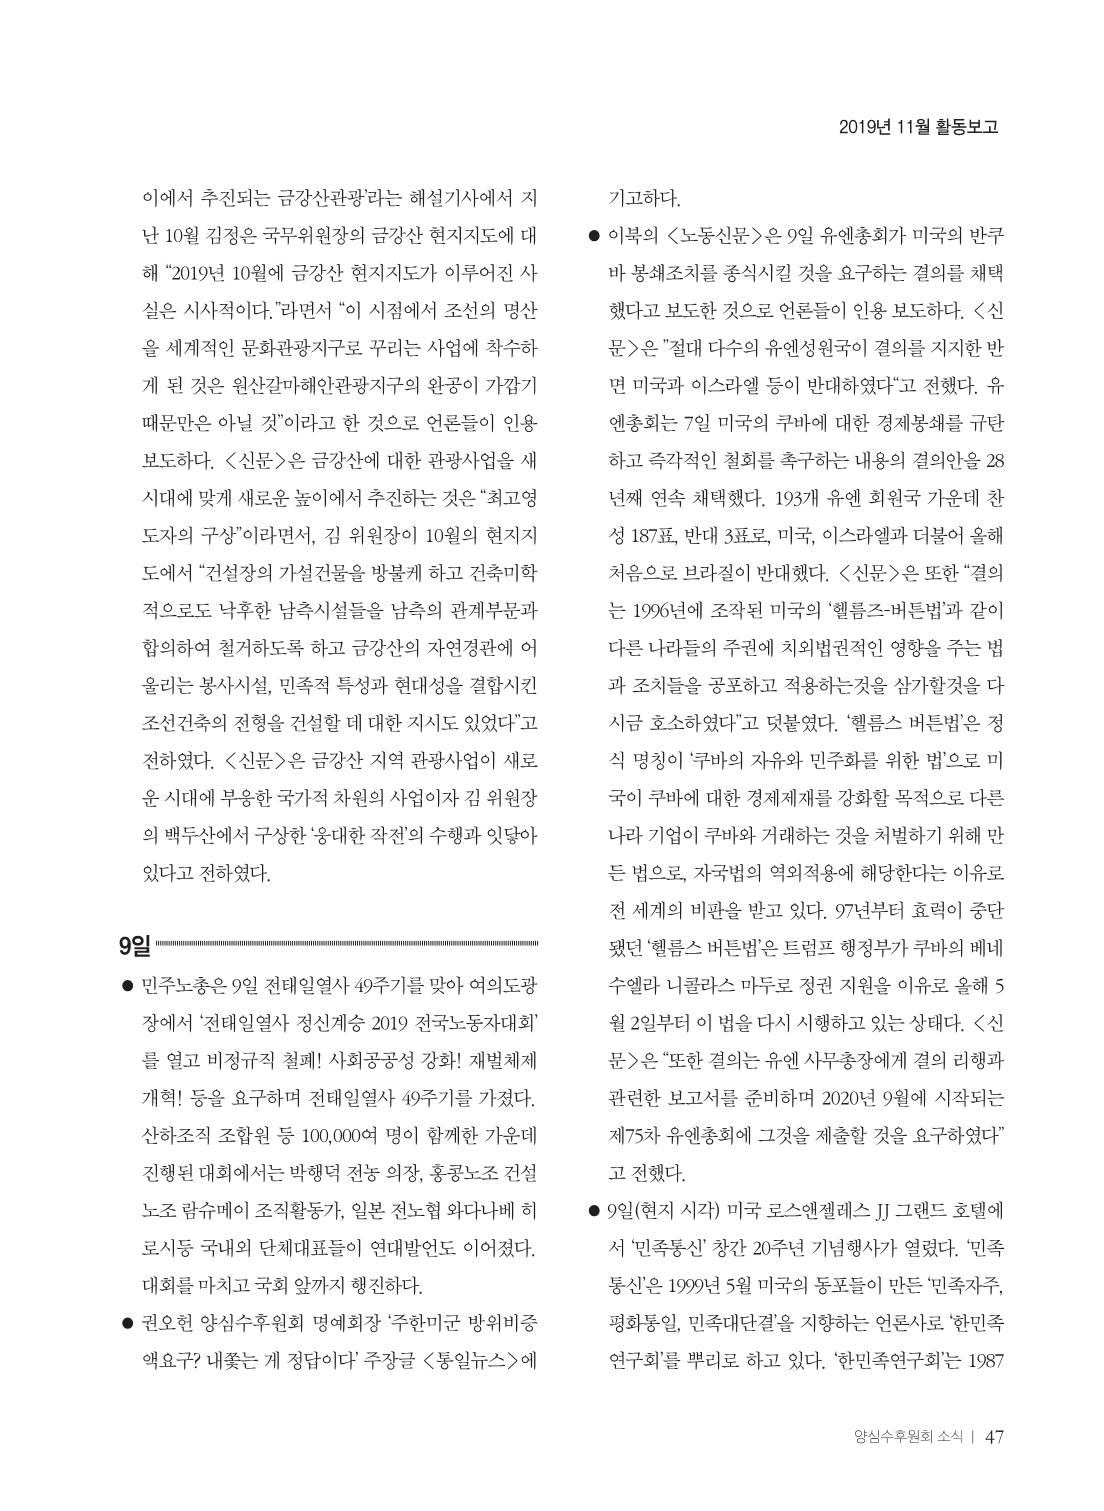 5802db1f-6a90-451c-ac2e-da2a23bee939.pdf-0049.jpg